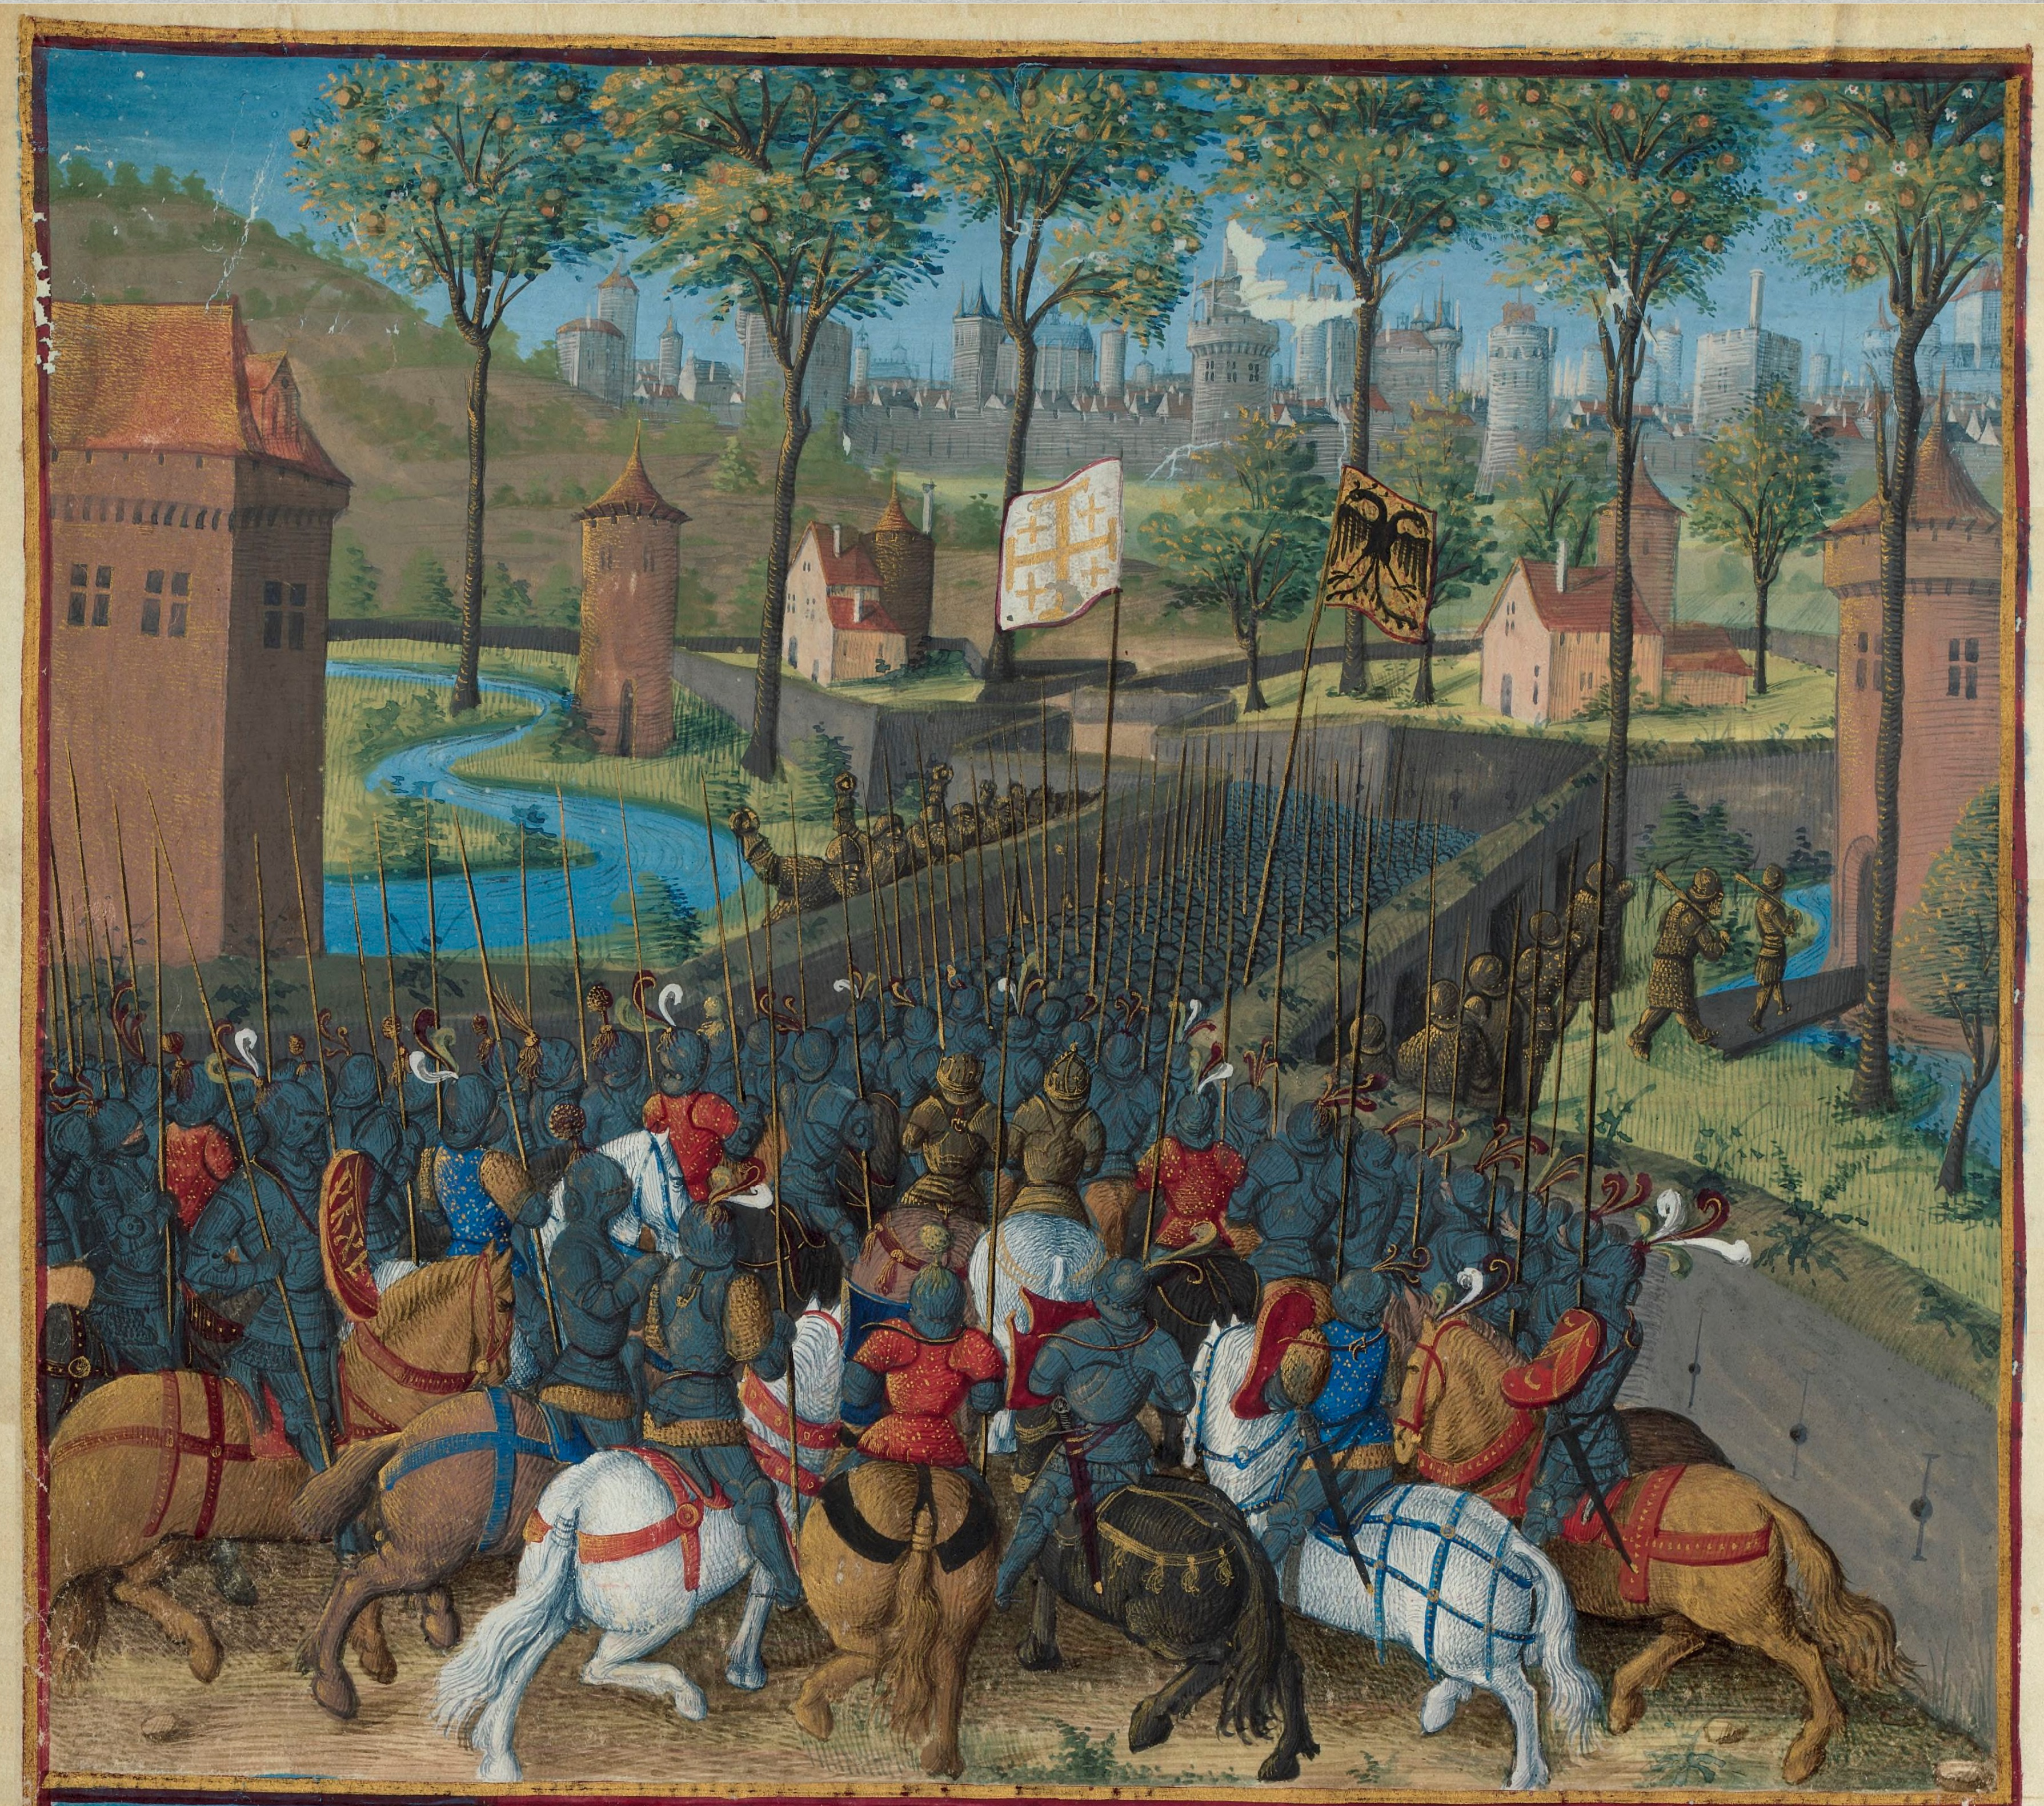 Crusaders The 2nd Crusade